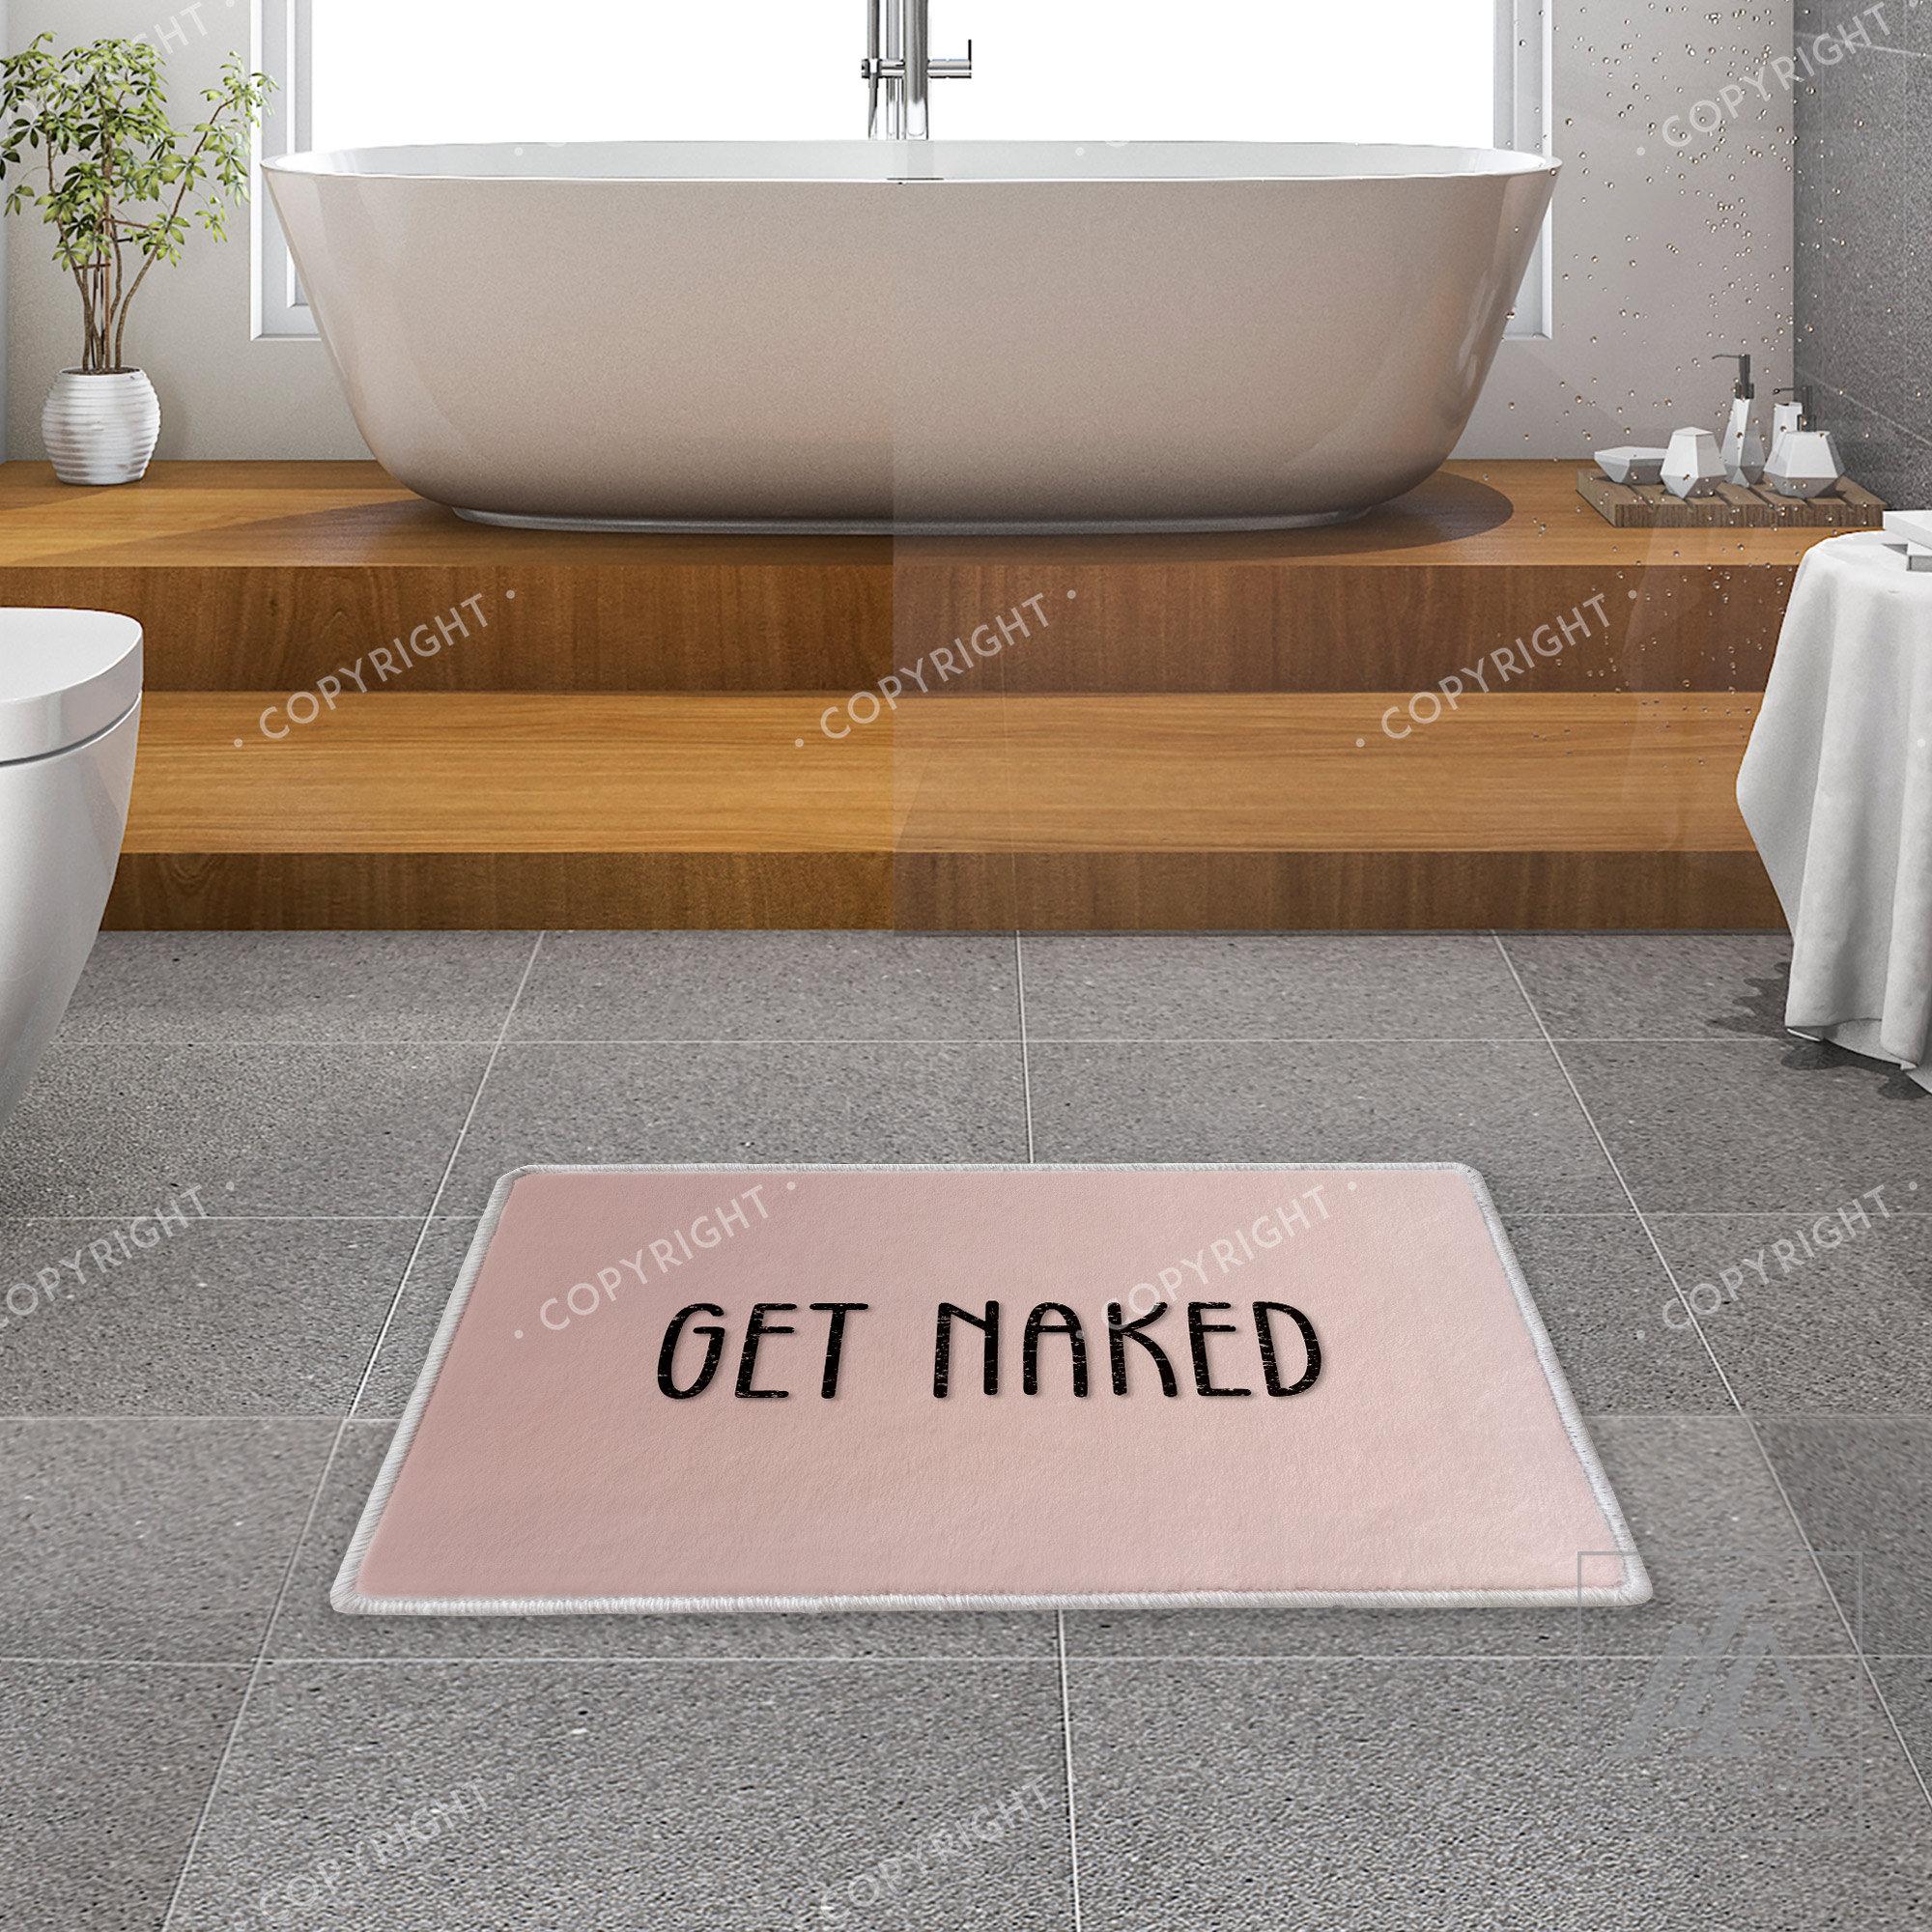 Get Naked Black Background Non-slip Rug Floor Door Carpet Bathroom Decor Mat